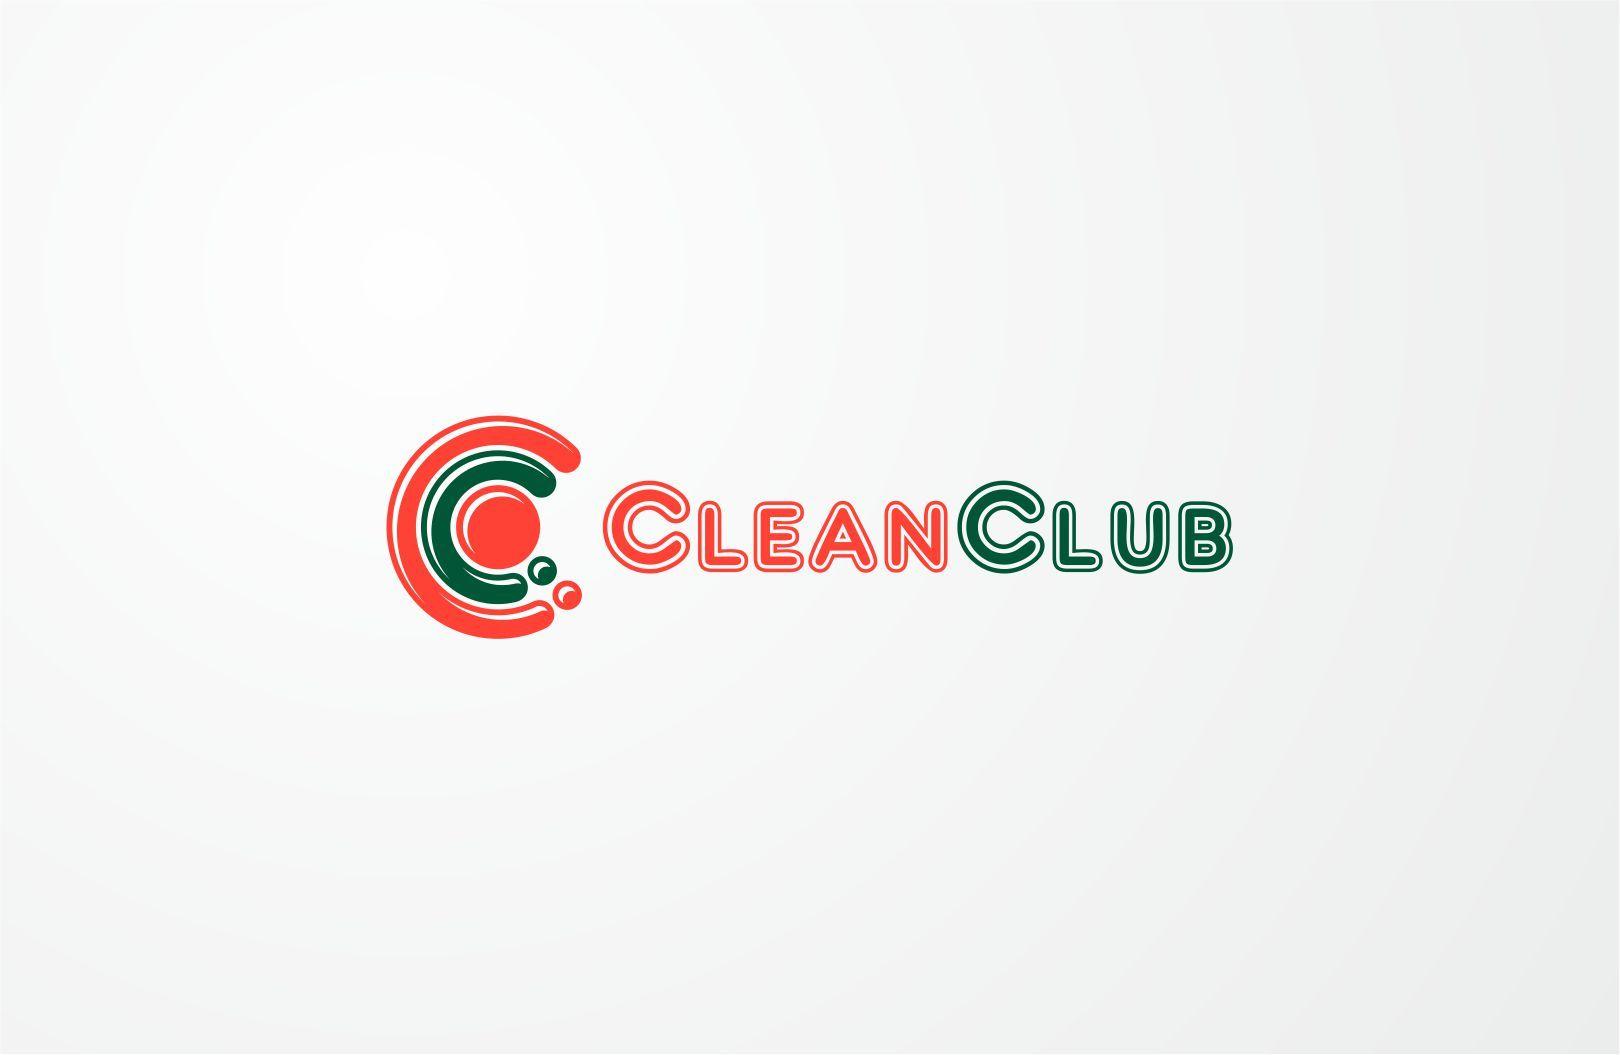 Логотип для CleanClub - дизайнер graphin4ik